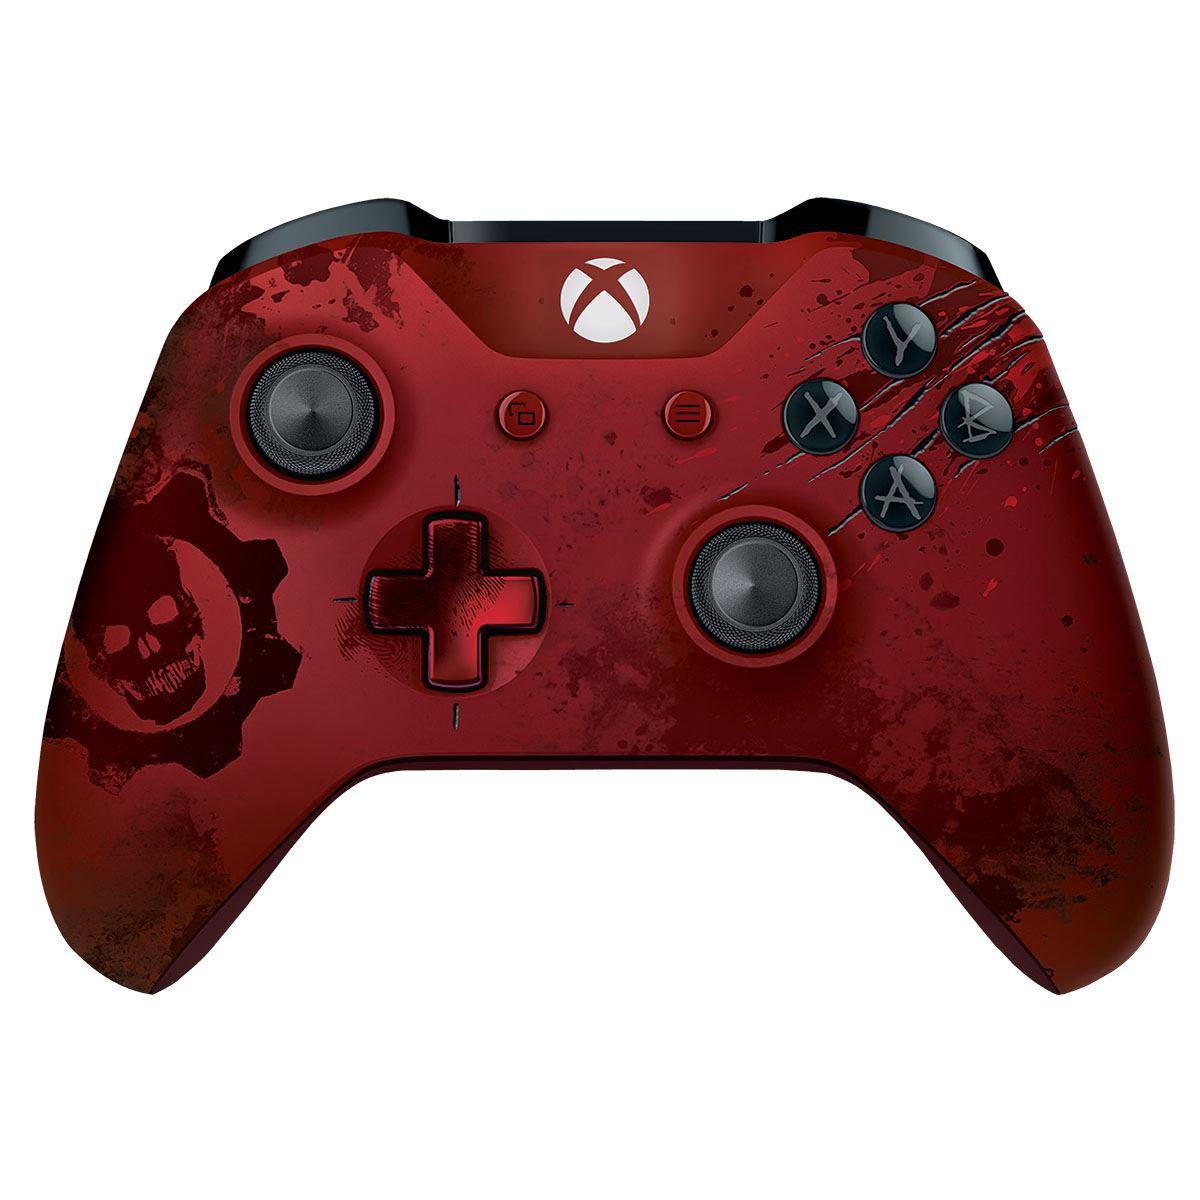 Claro Shop: Xbox One - Control Crimson GOW4 ó Control Negro con Play and charge